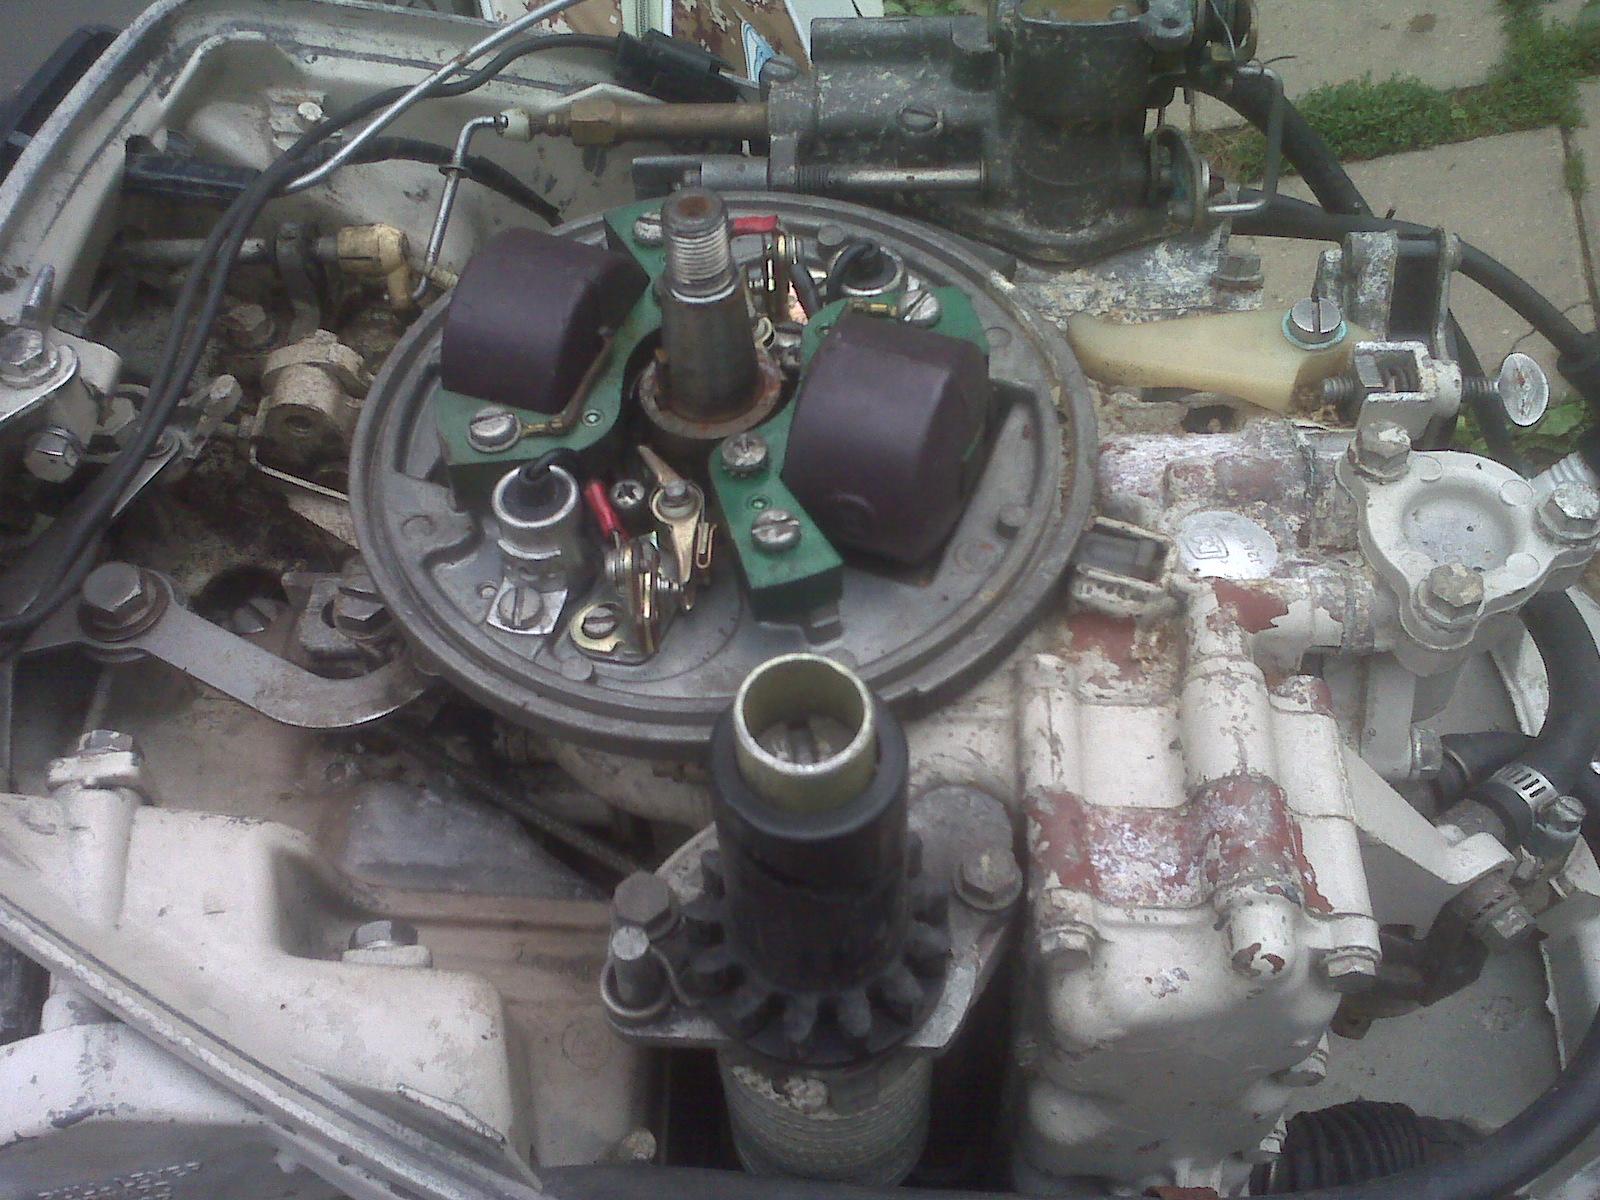 Diagram Of 1986 J15rcde Johnson Outboard Fuel Pump Diagram And Parts